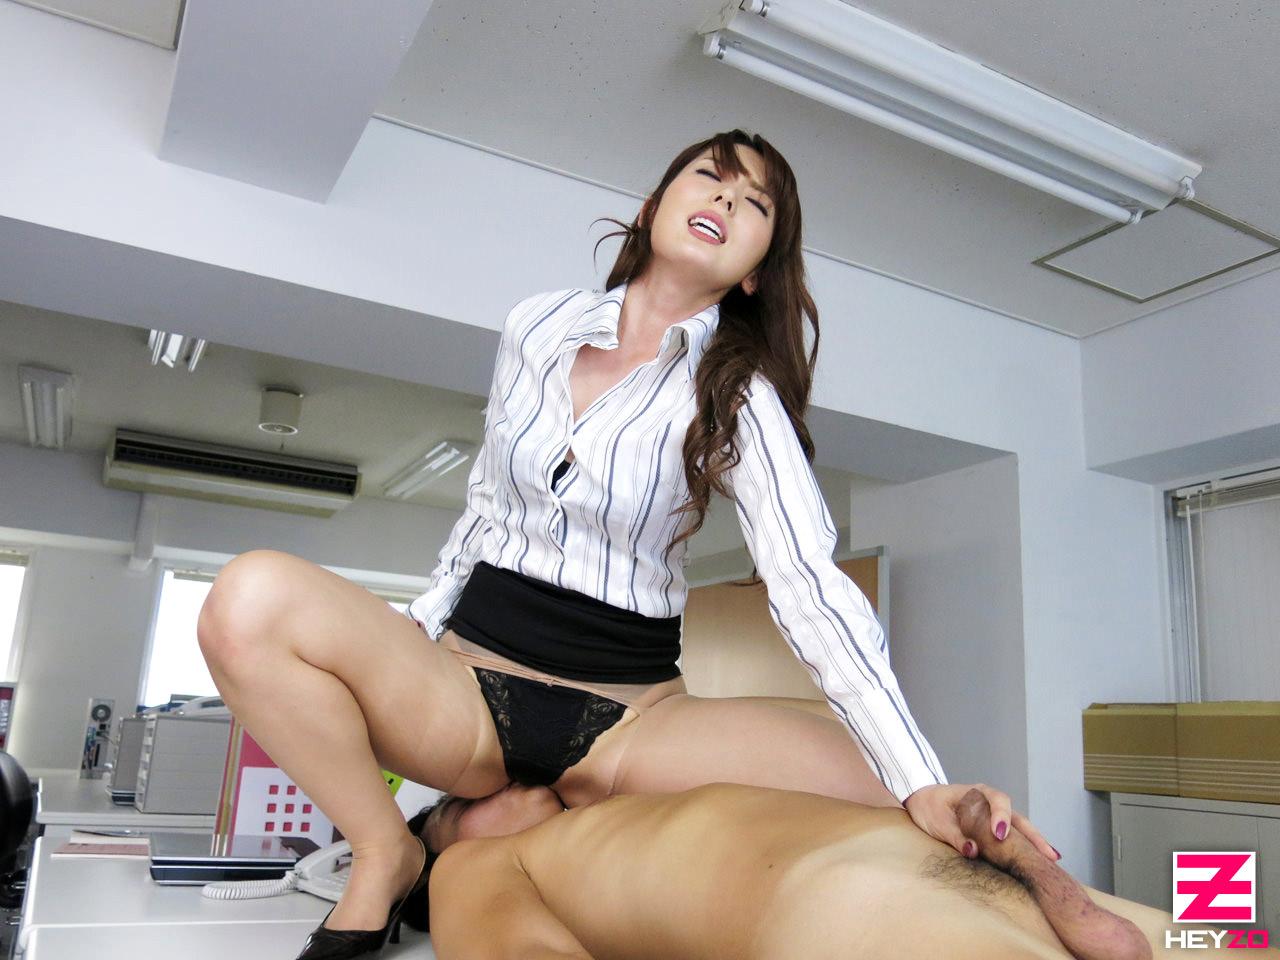 эротика секретарши видео азиат еще